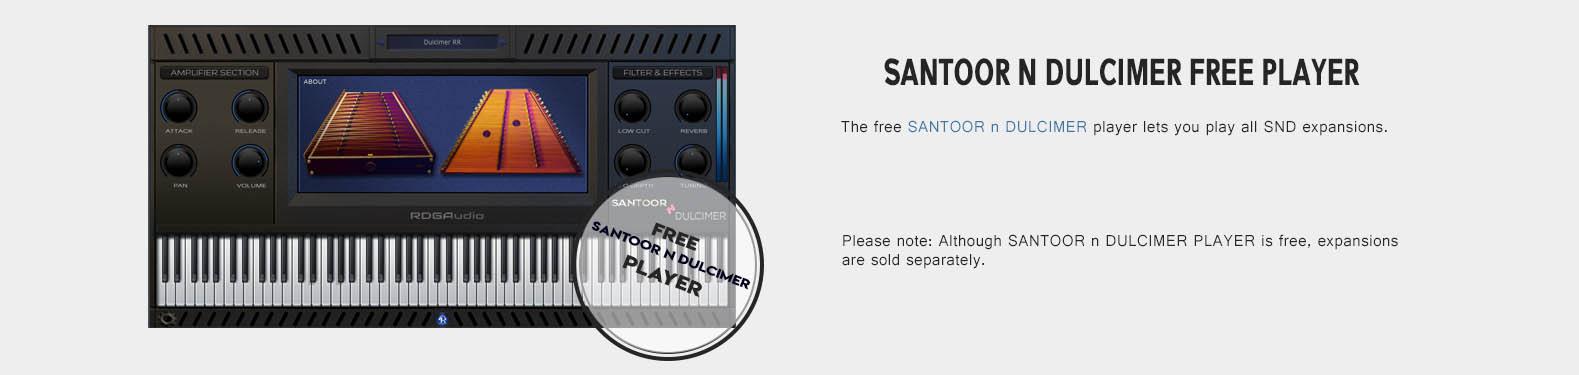 Santor n Dulcimer FREE Player RDGAudio